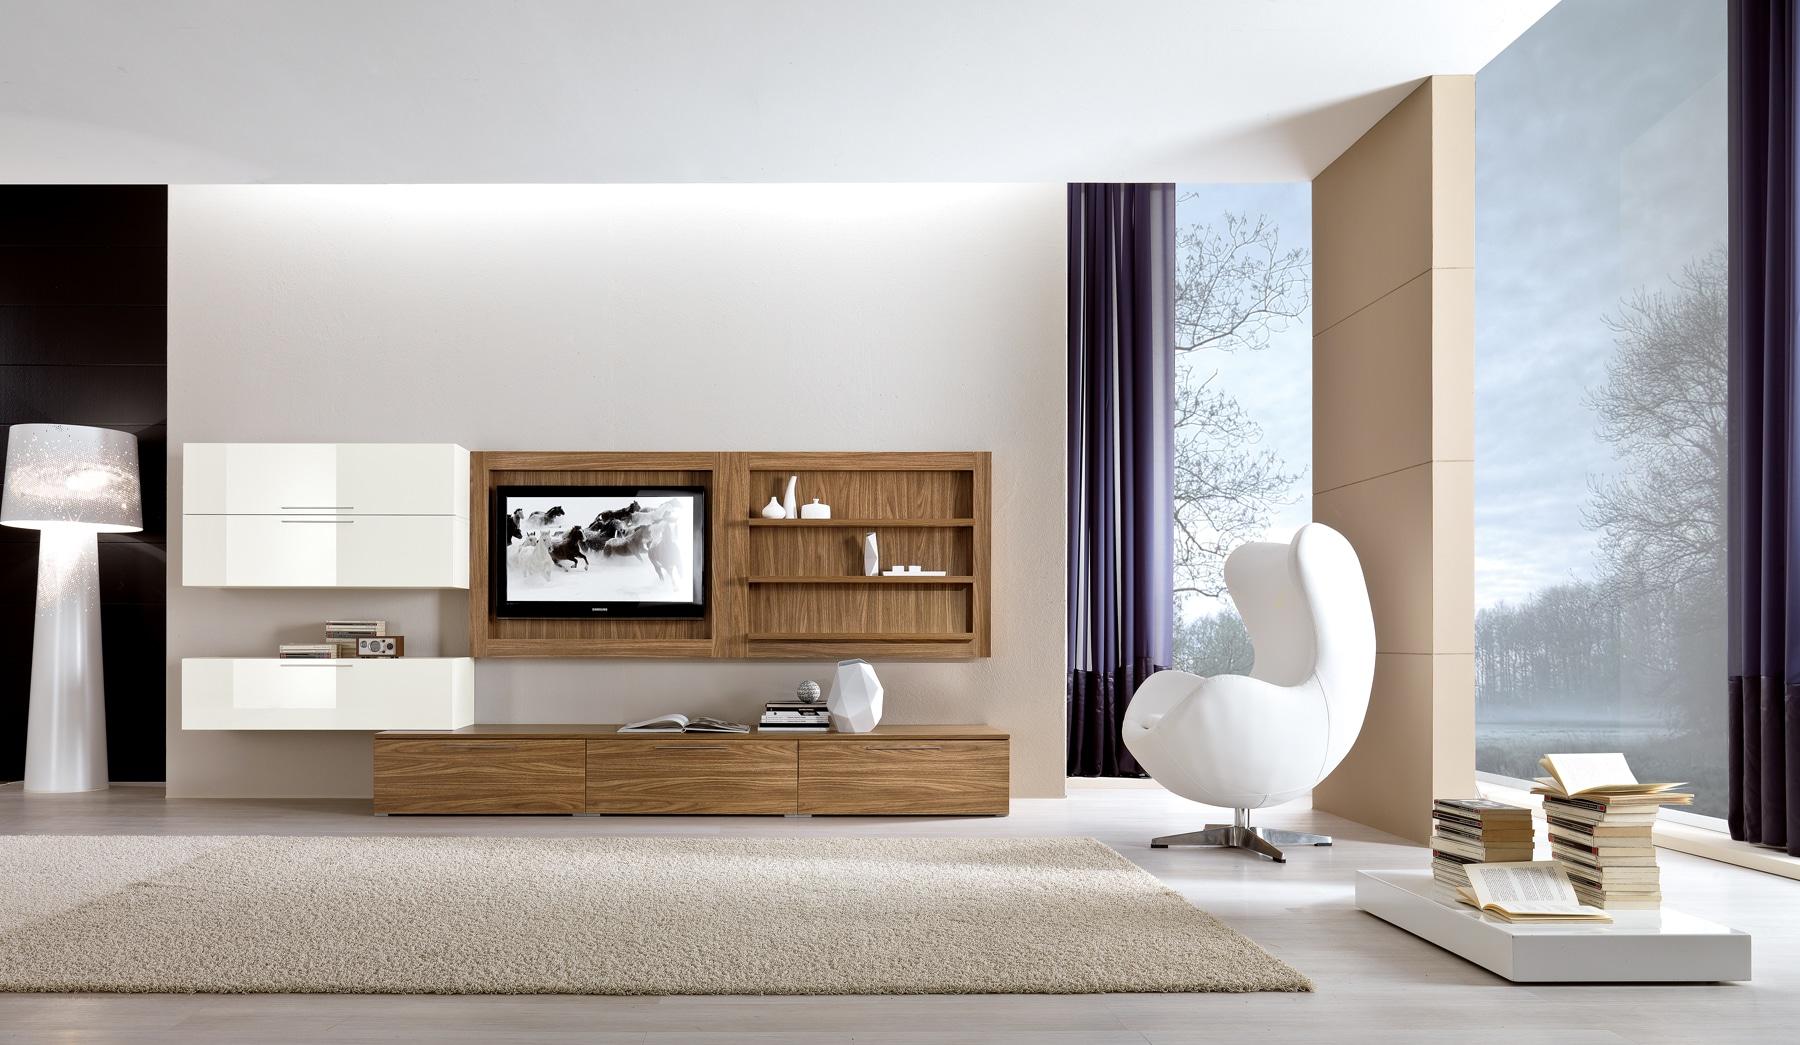 Fitwell Quality Furniture - Malta